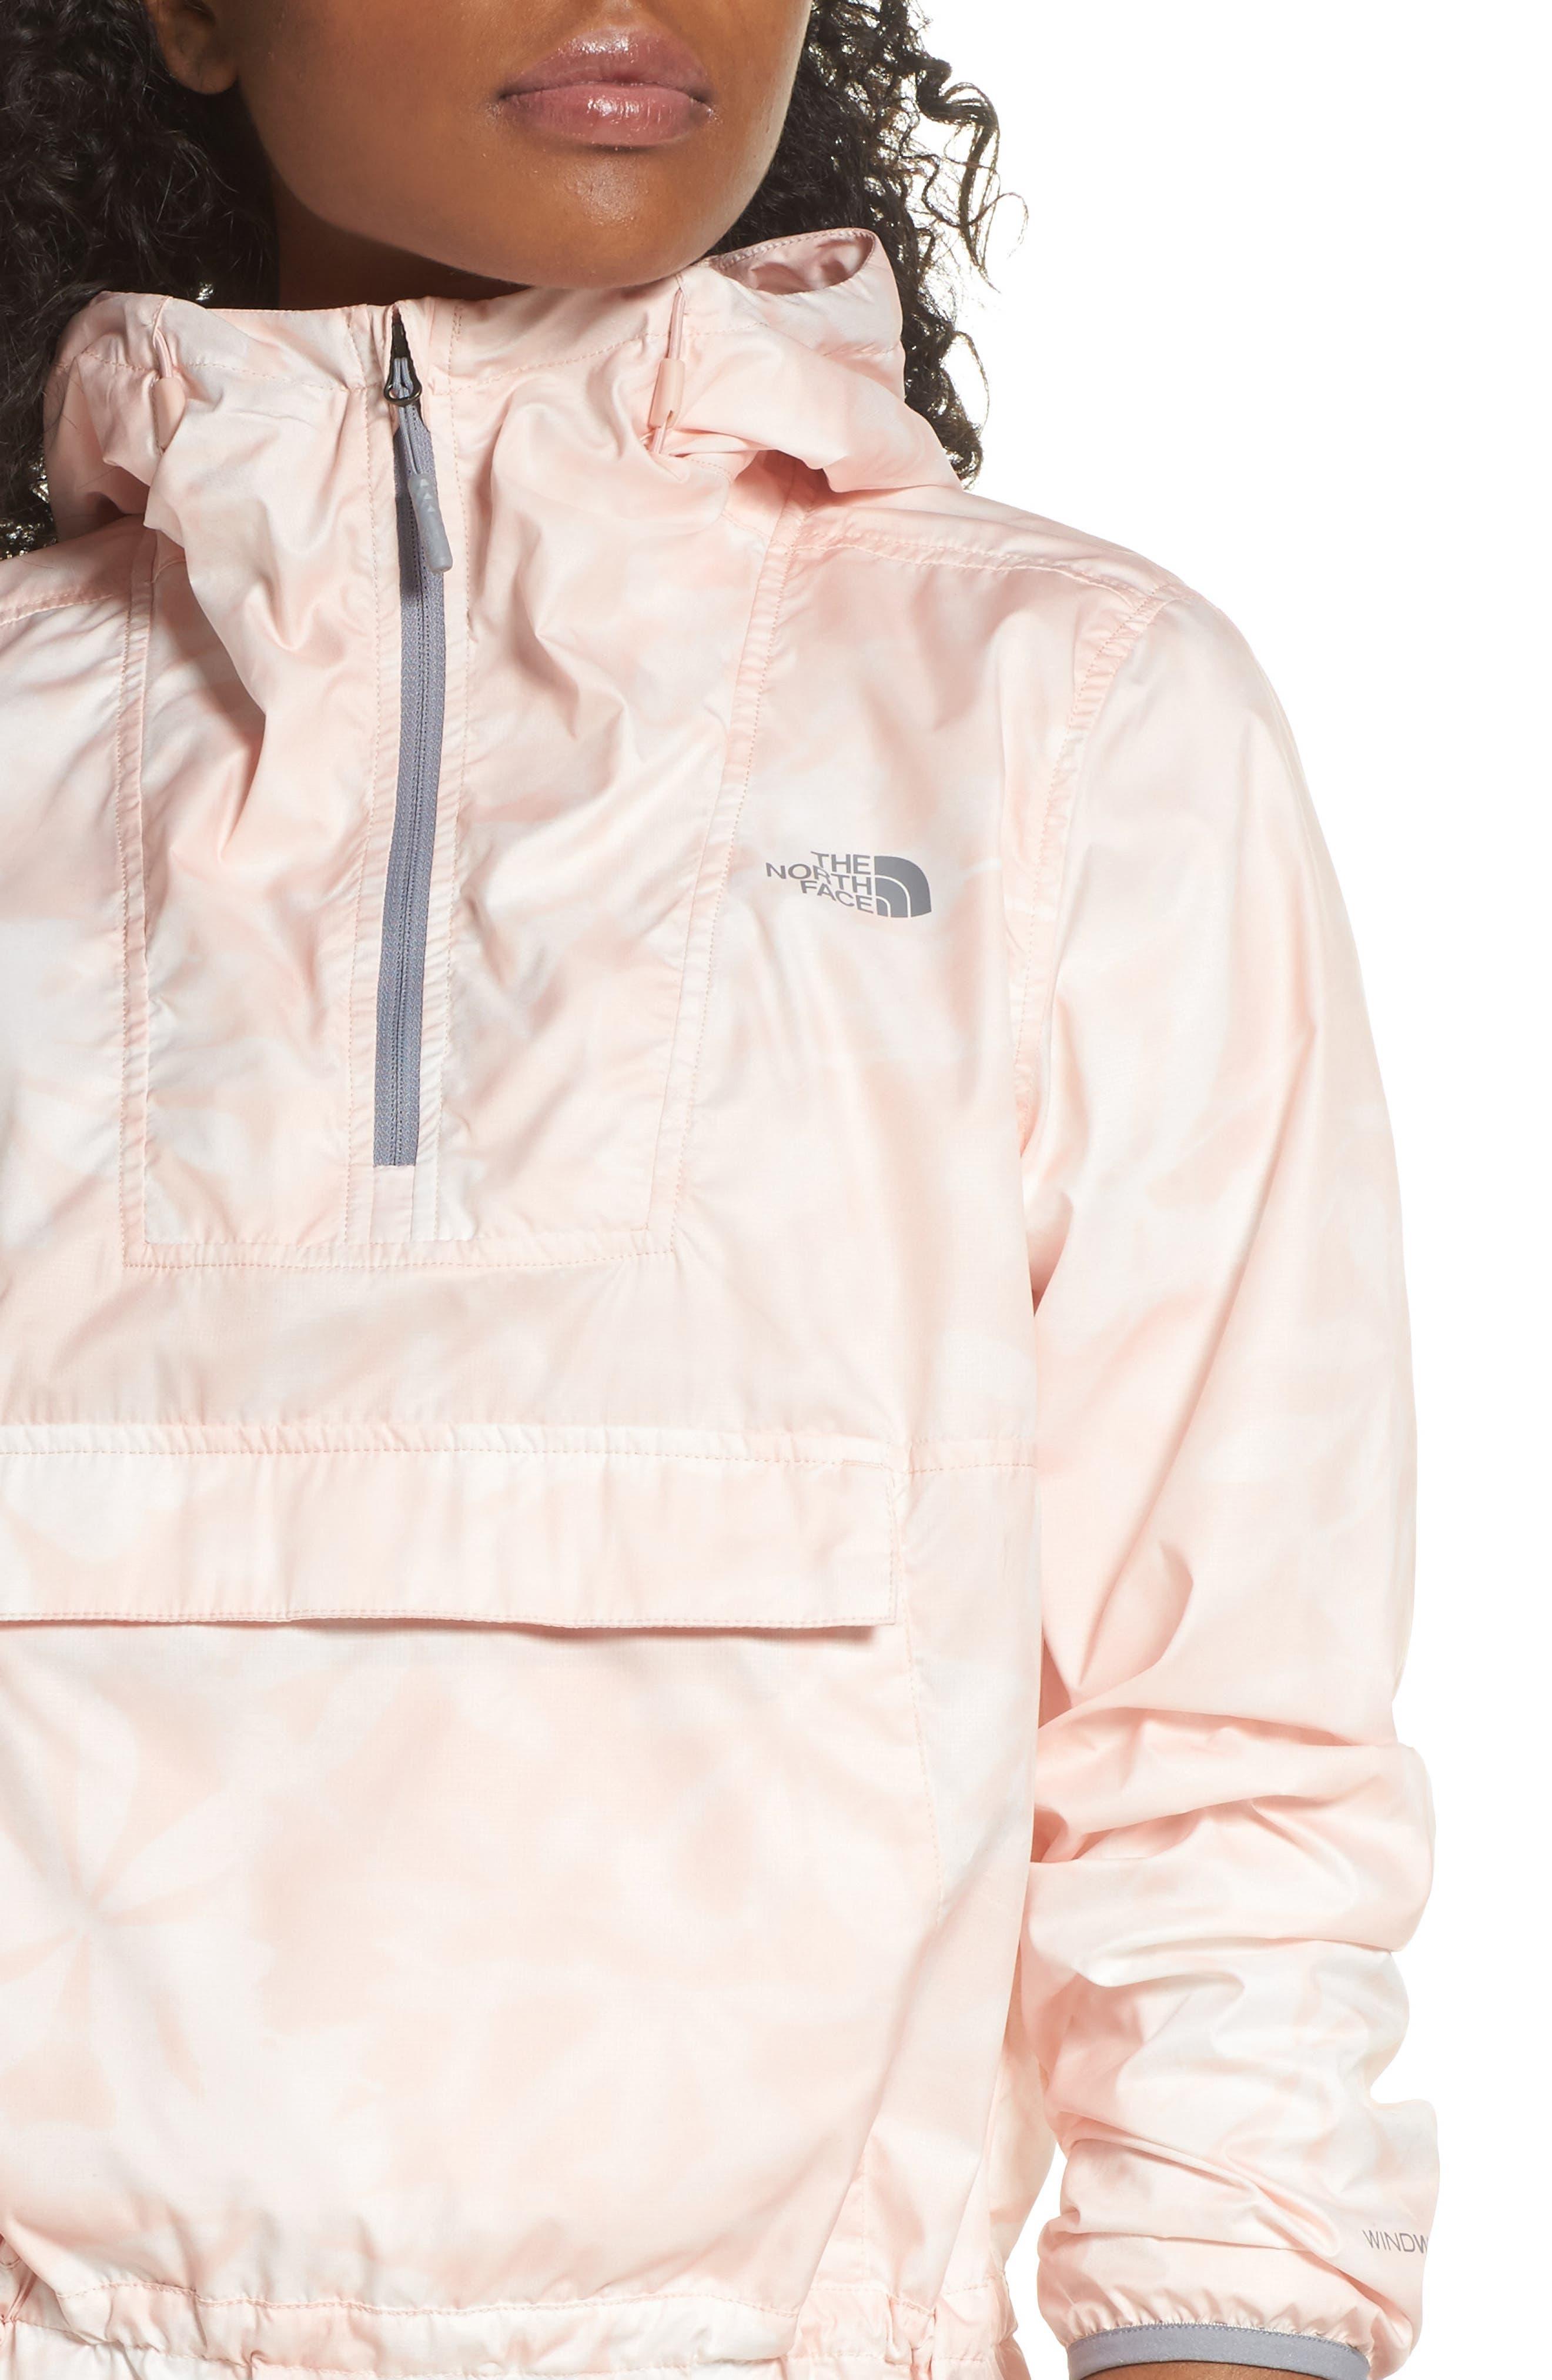 Fanorak Jacket,                             Alternate thumbnail 6, color,                             EVENING SAND LUPINE PRINT